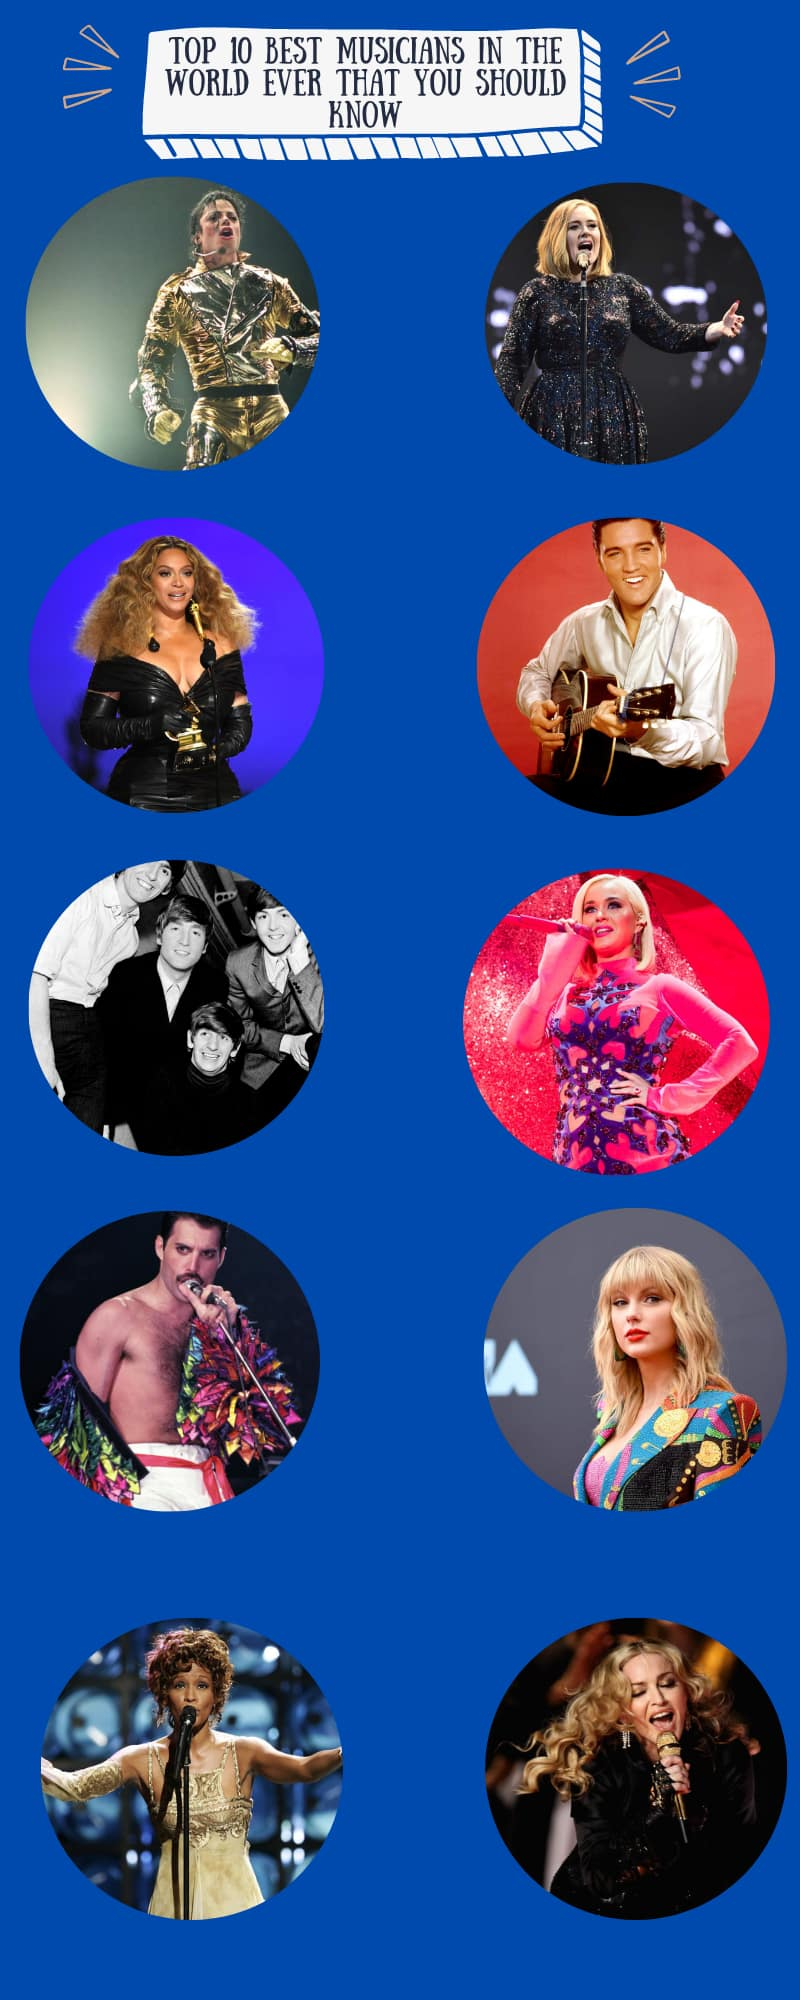 Best musicians in the world